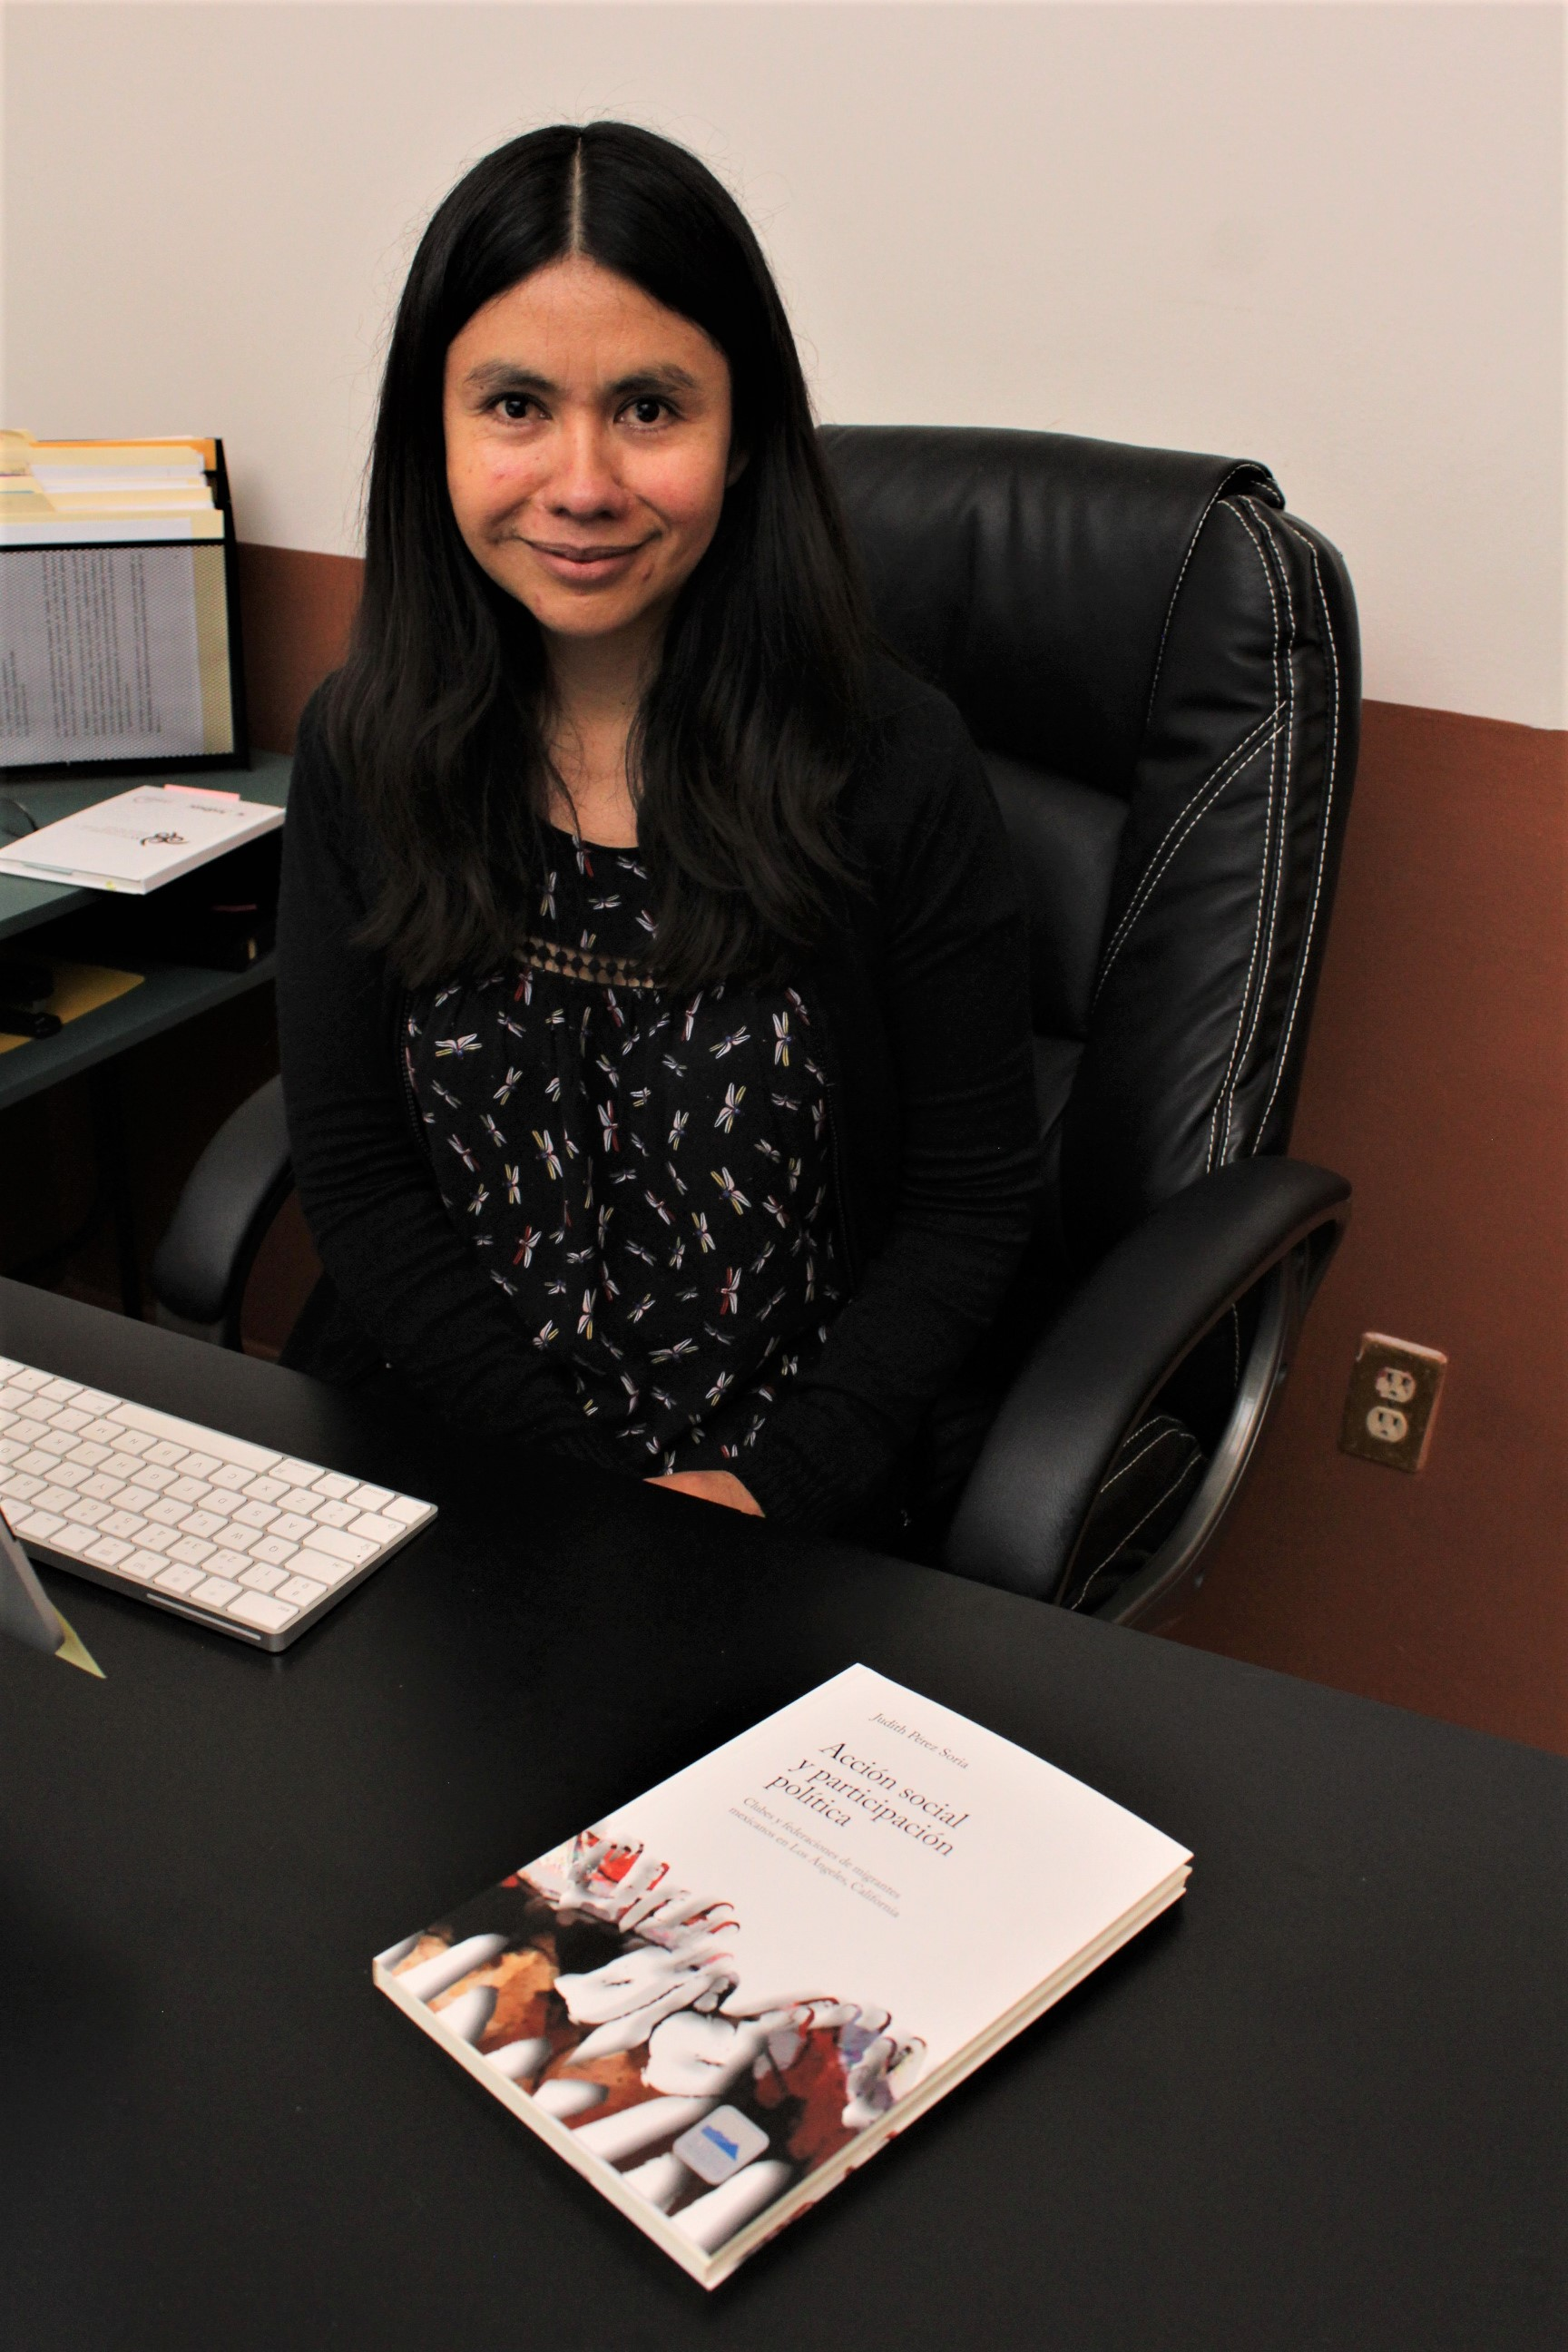 Judith Pérez Soria